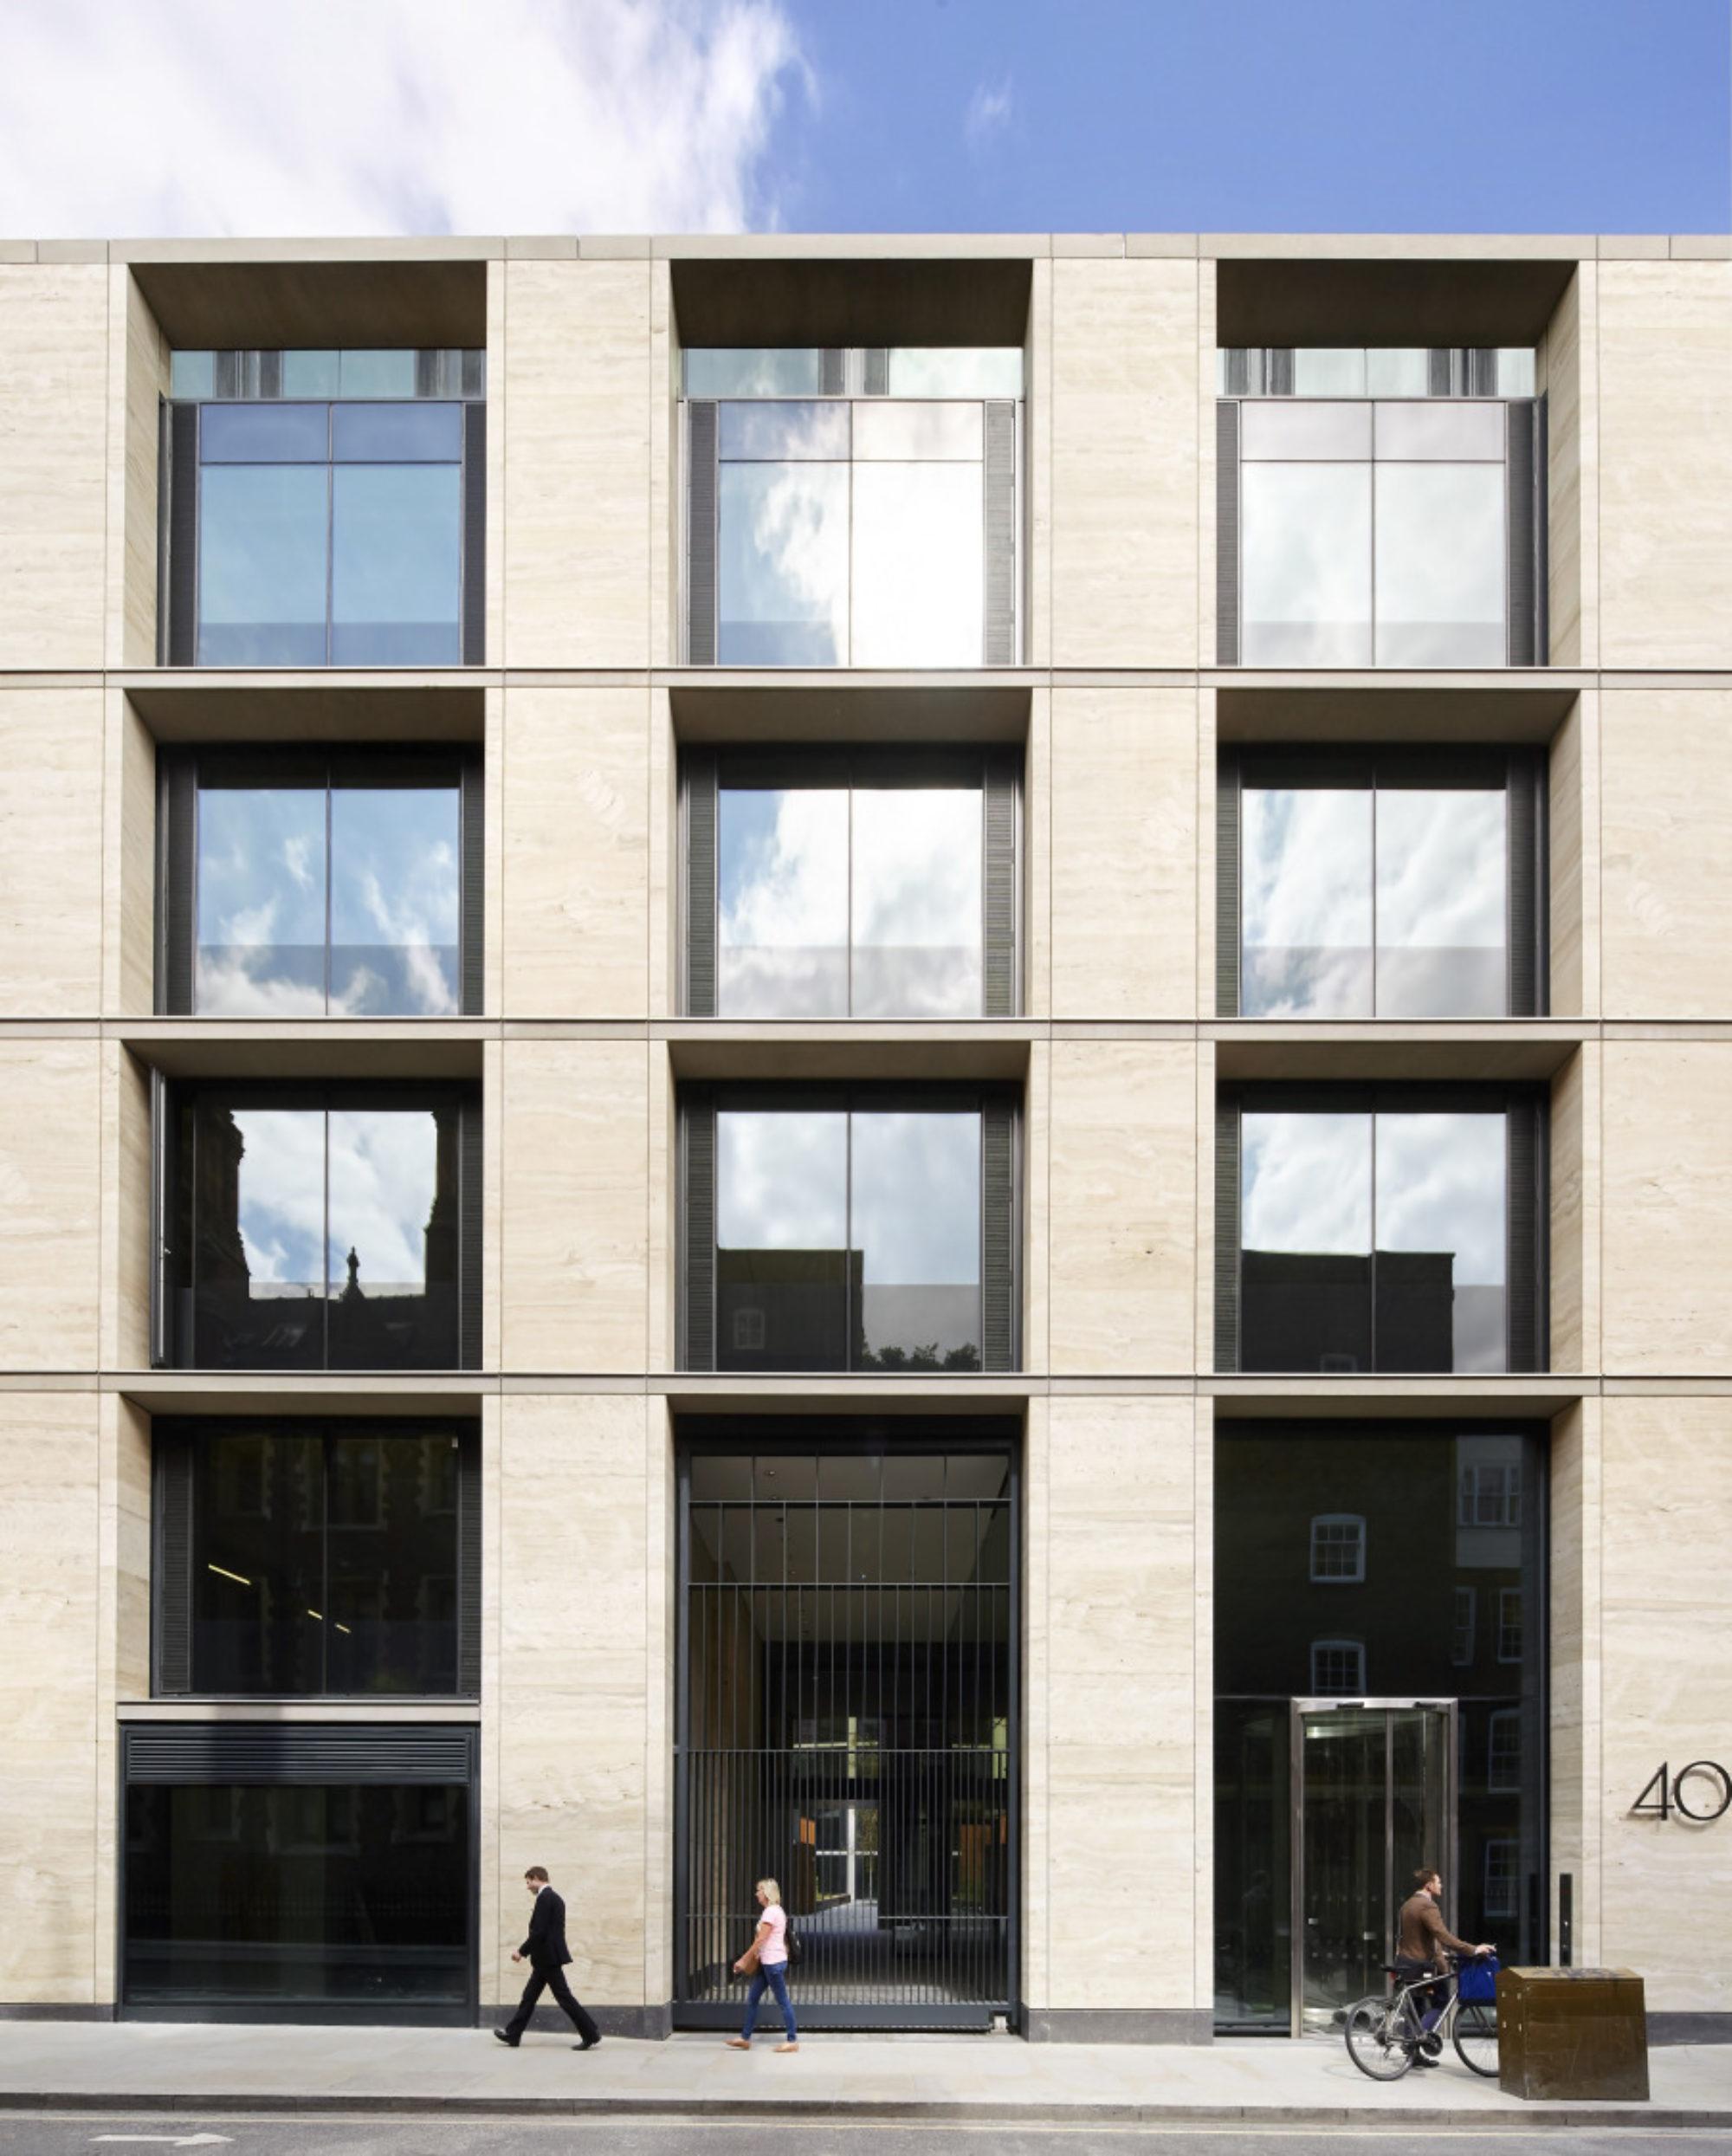 40 Chancery Lane wins RIBA London and RIBA National awards 2017